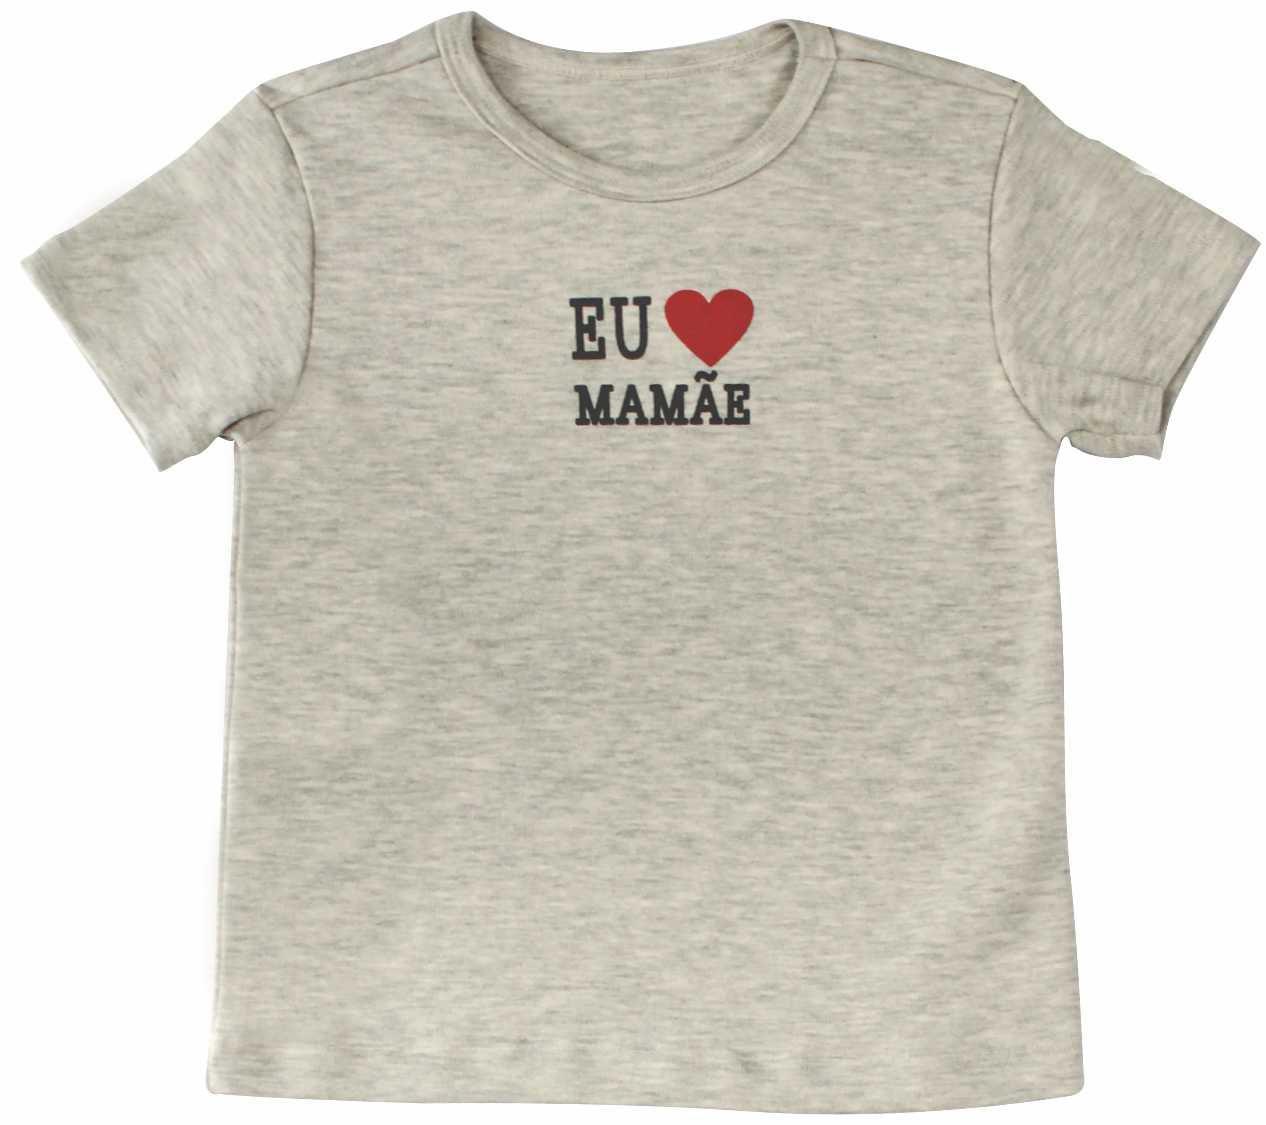 Camisa Unissex Manga Curta Eu Amo a Mamãe BY BIBE